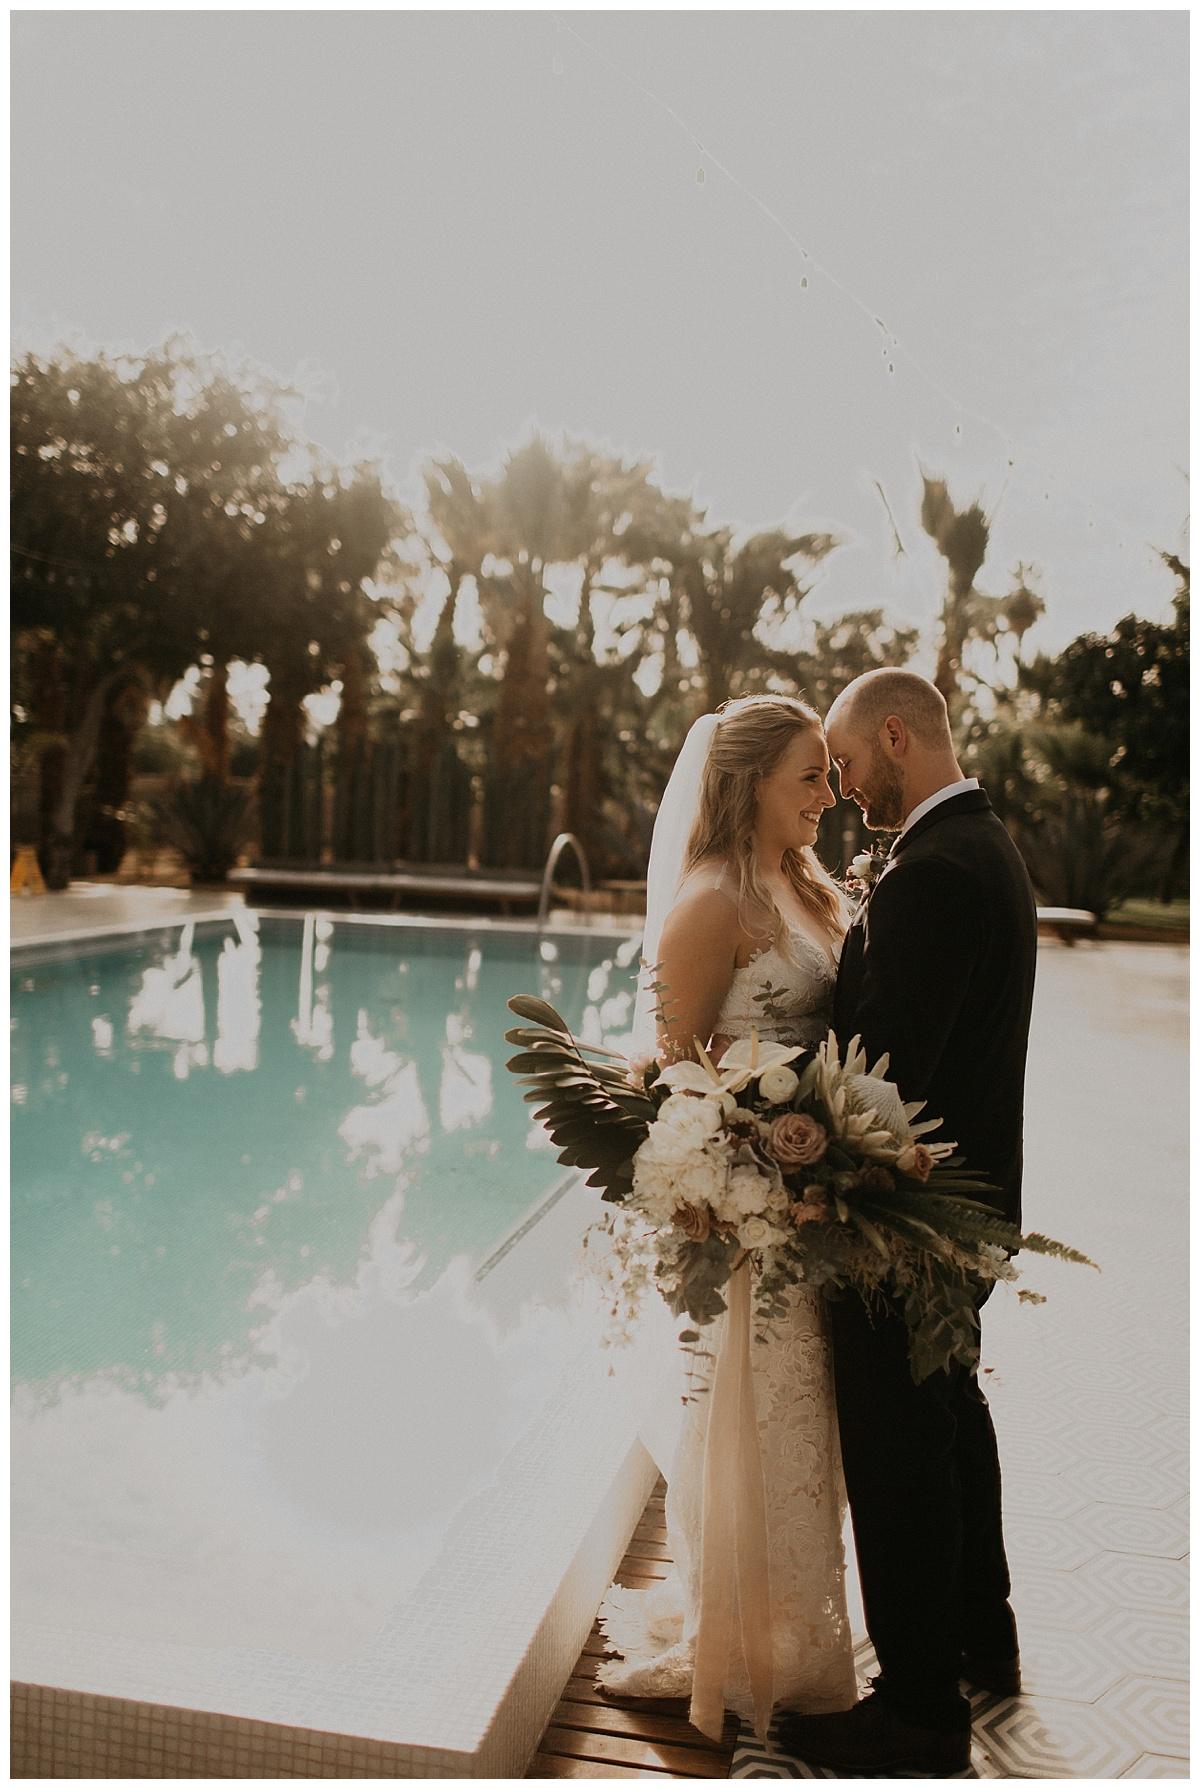 Bixby+Pine-PNW-Wedding-Planners-And-Designers_1778.jpg